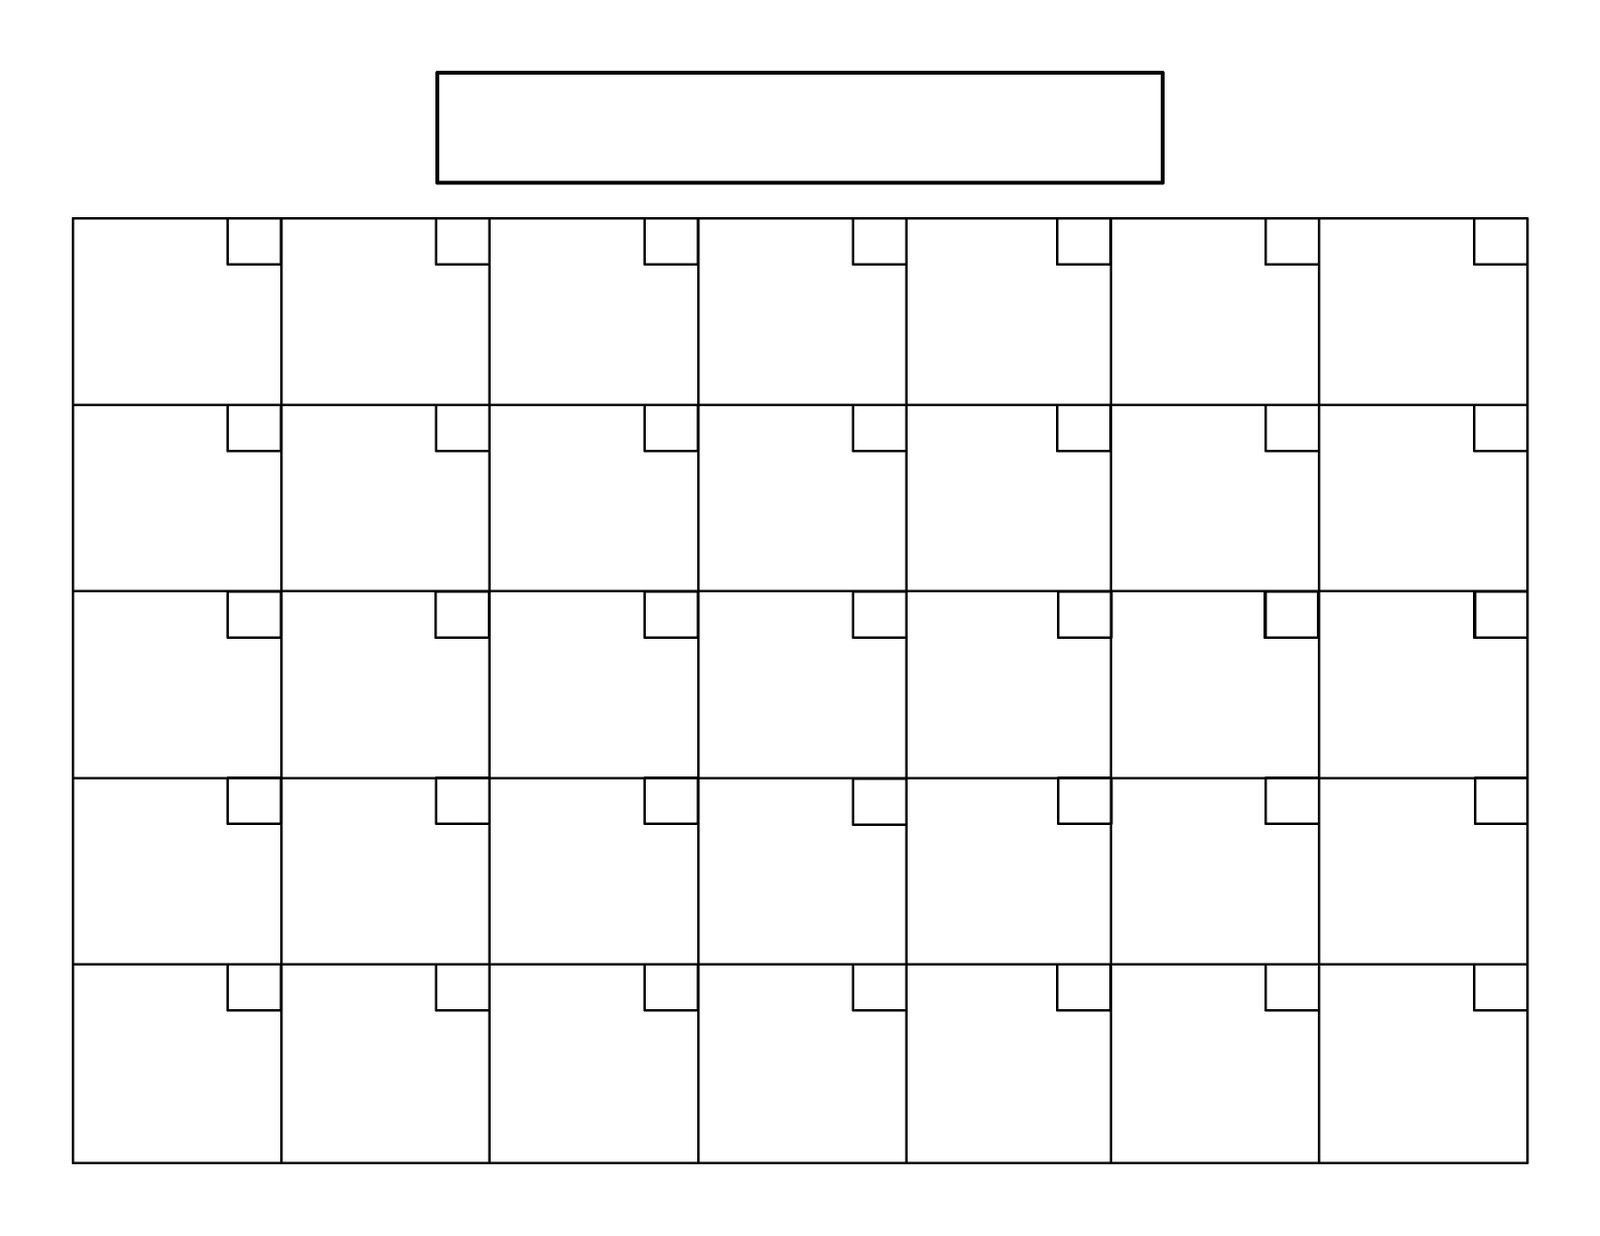 Perpetual Calendar Tutorial | Blank Calendar Template 31 Day Calendar Printable